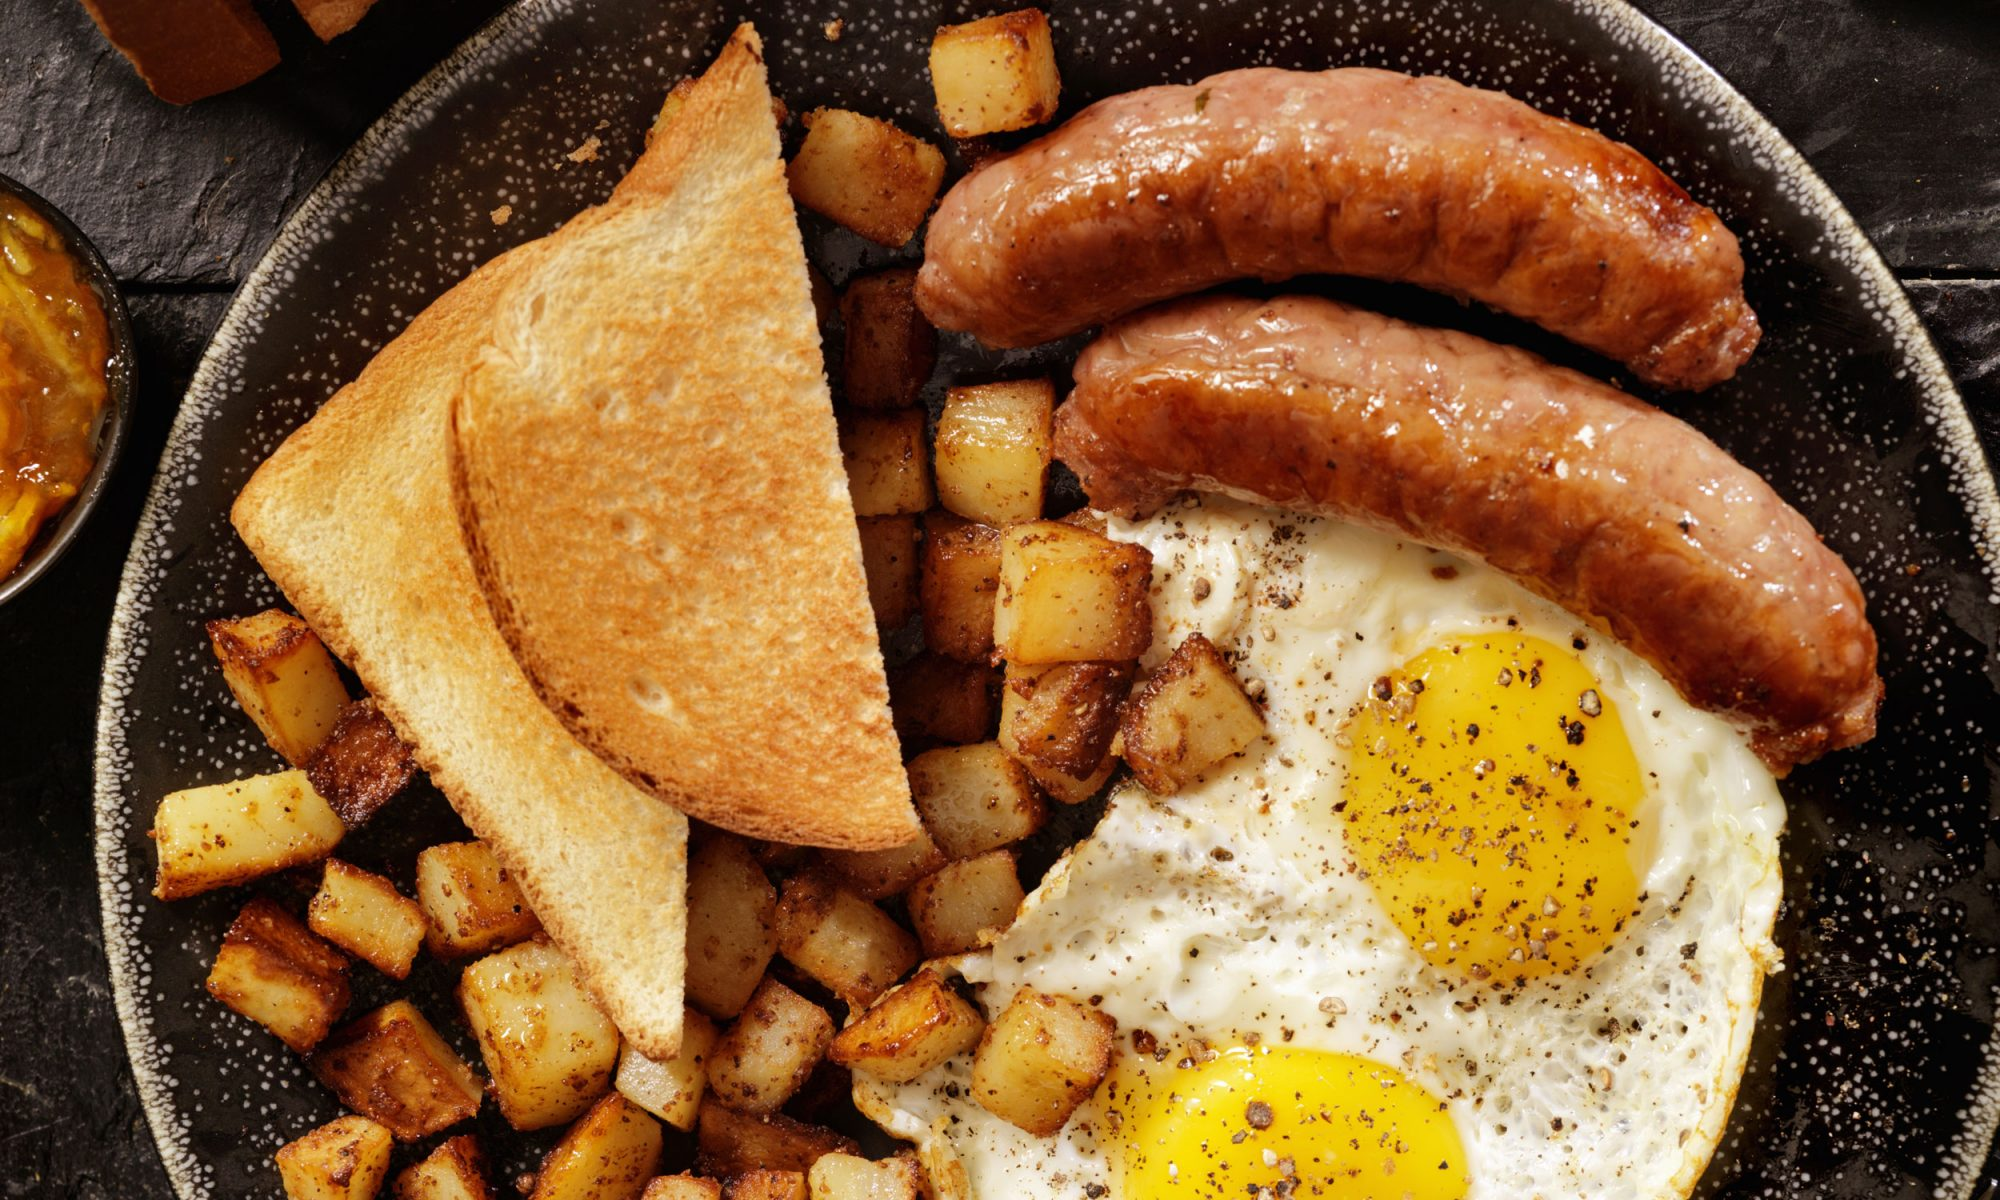 EC: Confessions of a Dirty, Breakfast-Cheating Bastard